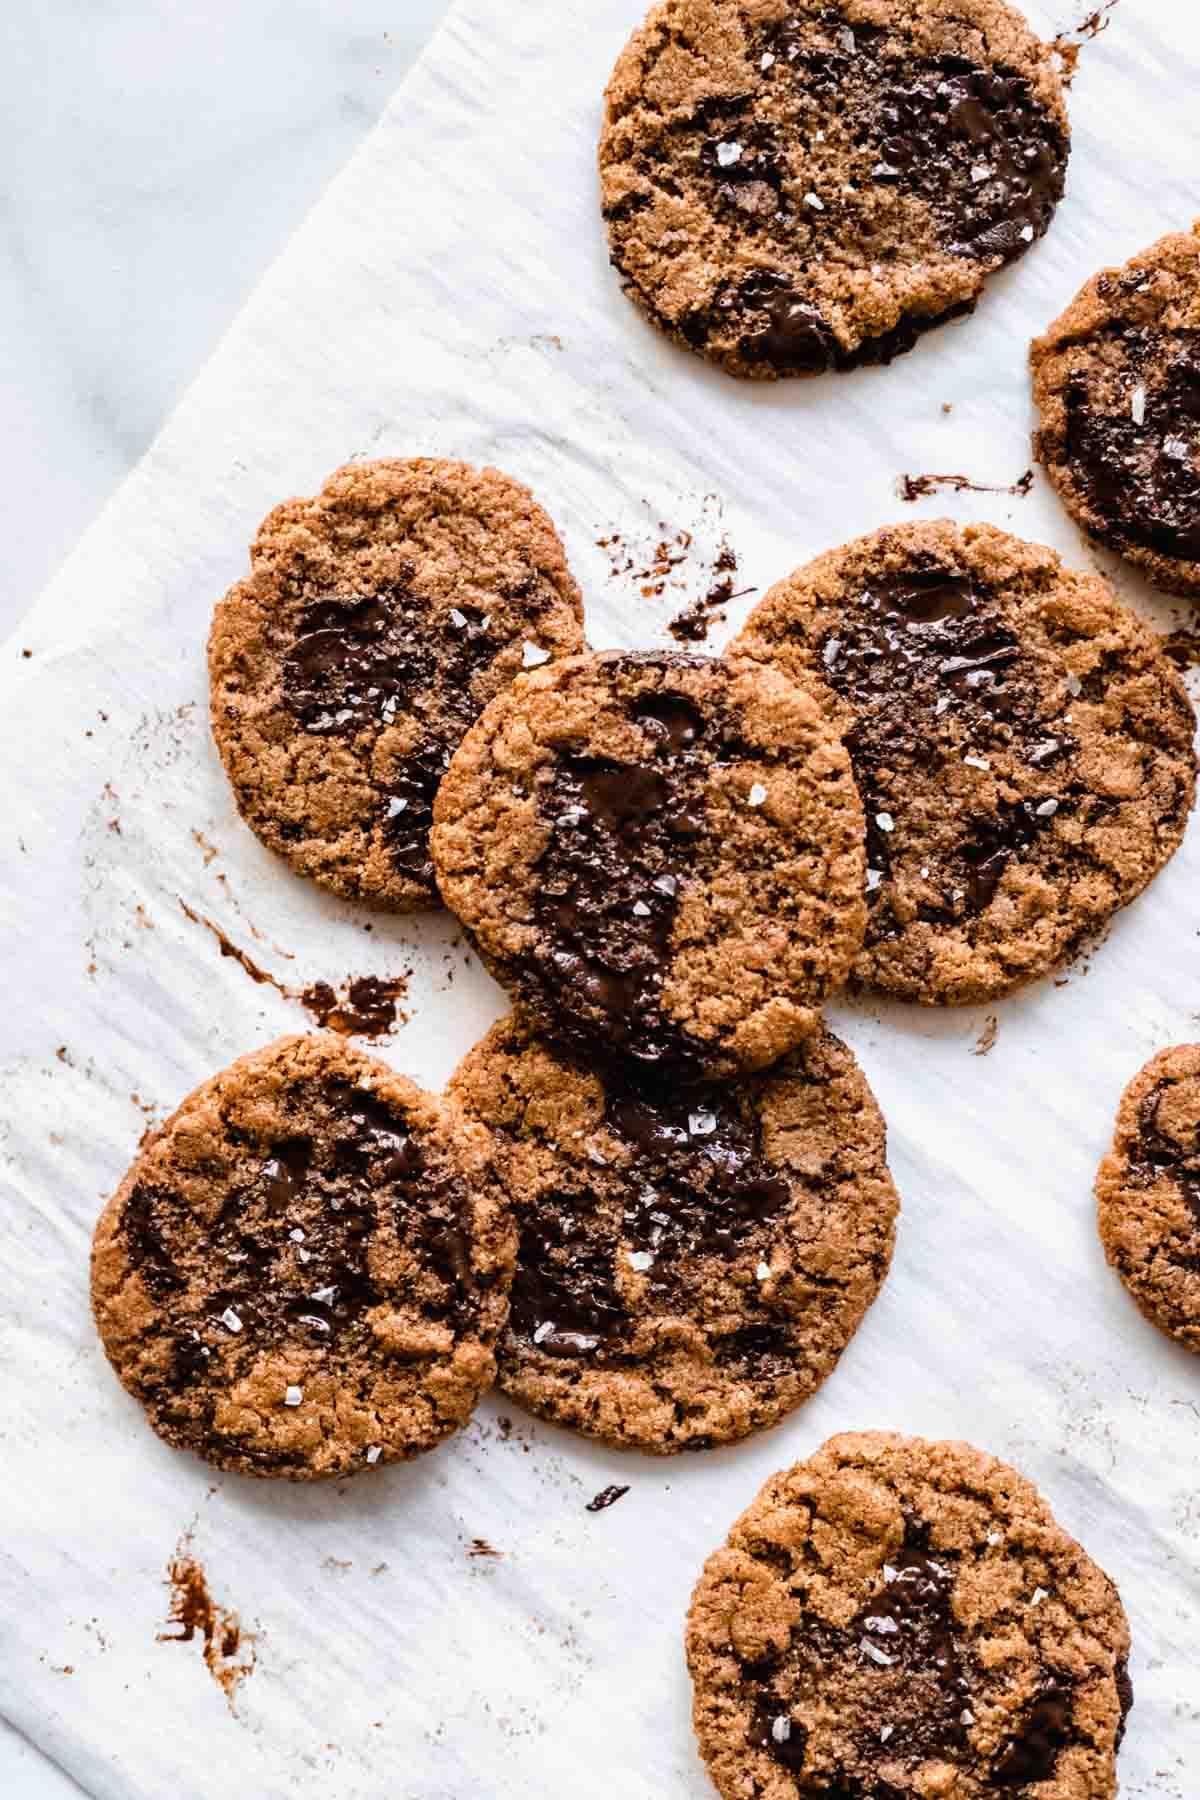 Flourless Almond Butter Chocolate Chip Cookies | katiebirdbakes